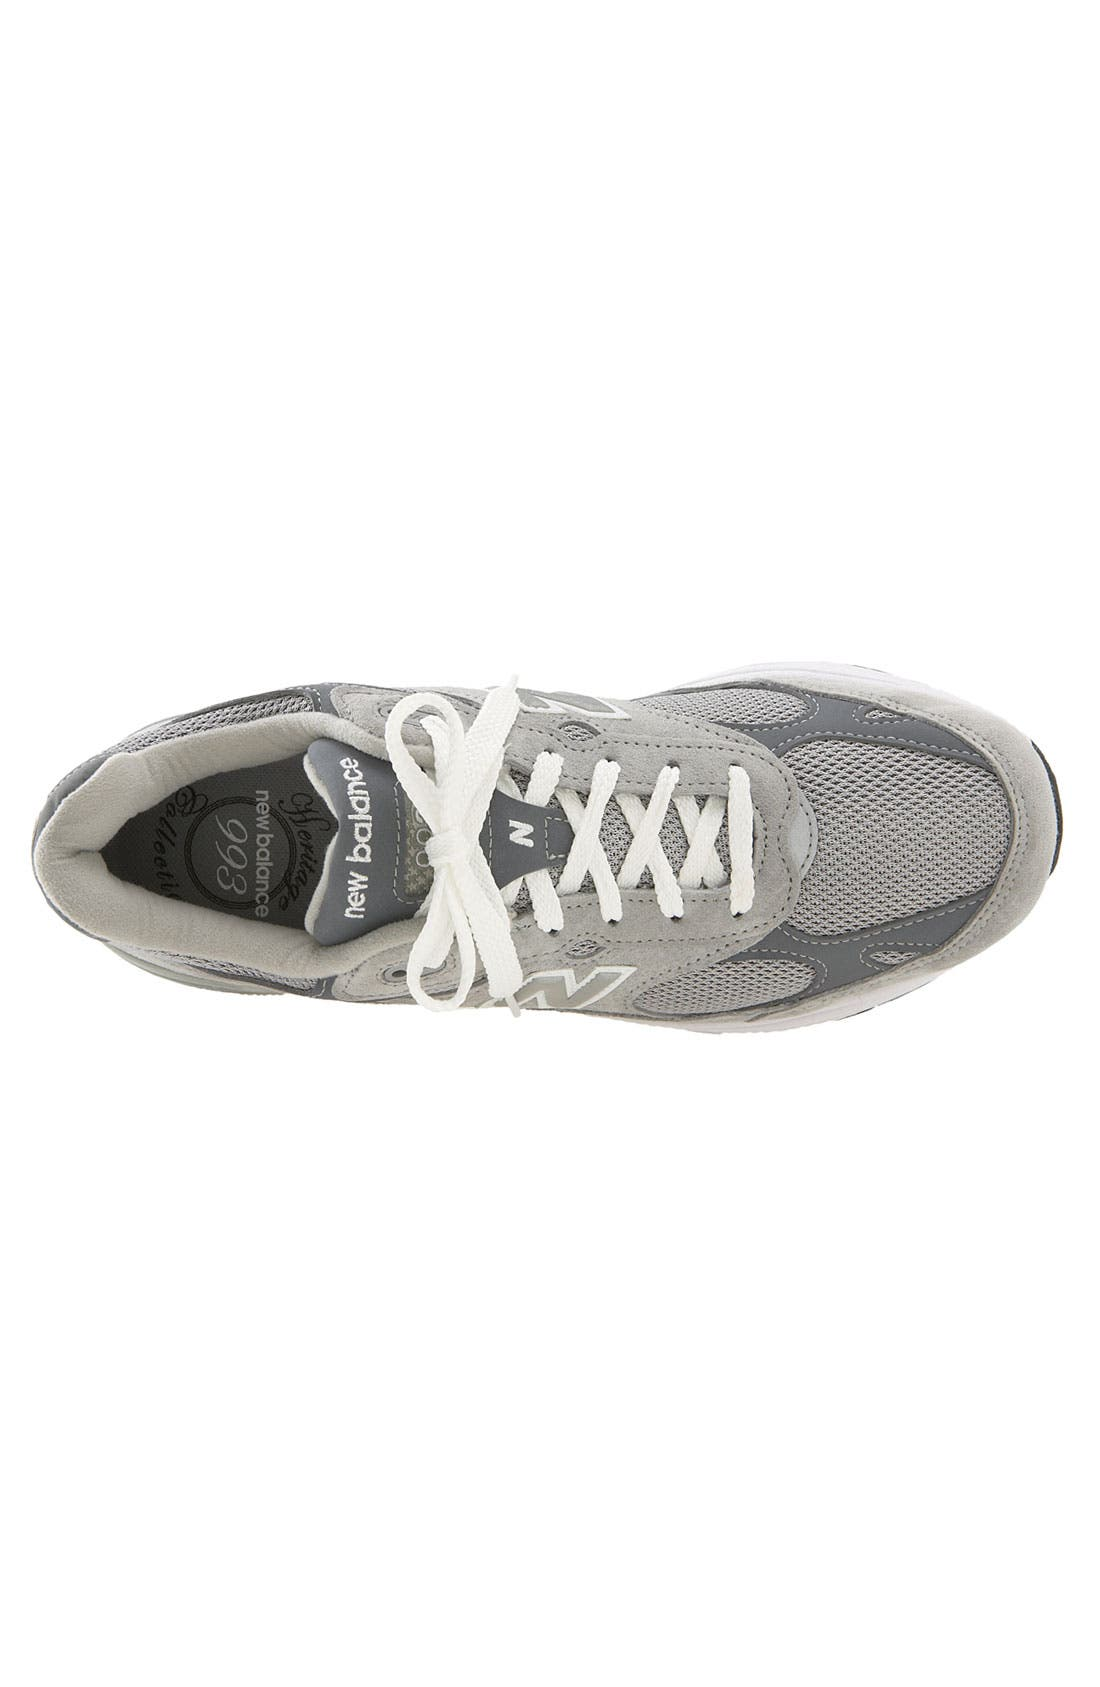 '993' Running Shoe,                             Alternate thumbnail 2, color,                             Grey